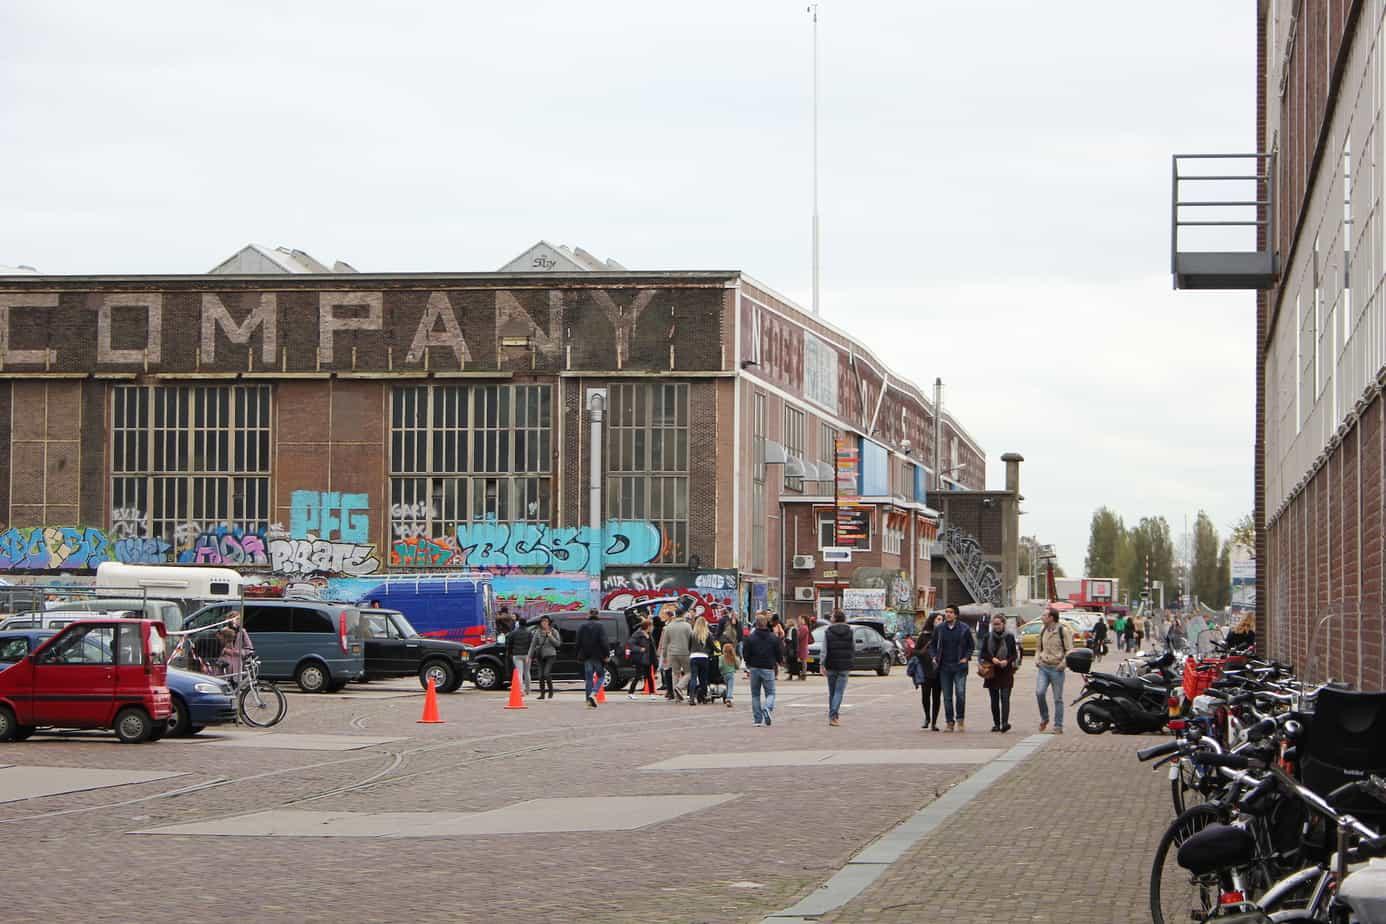 grootste rommelmarkt van nederland